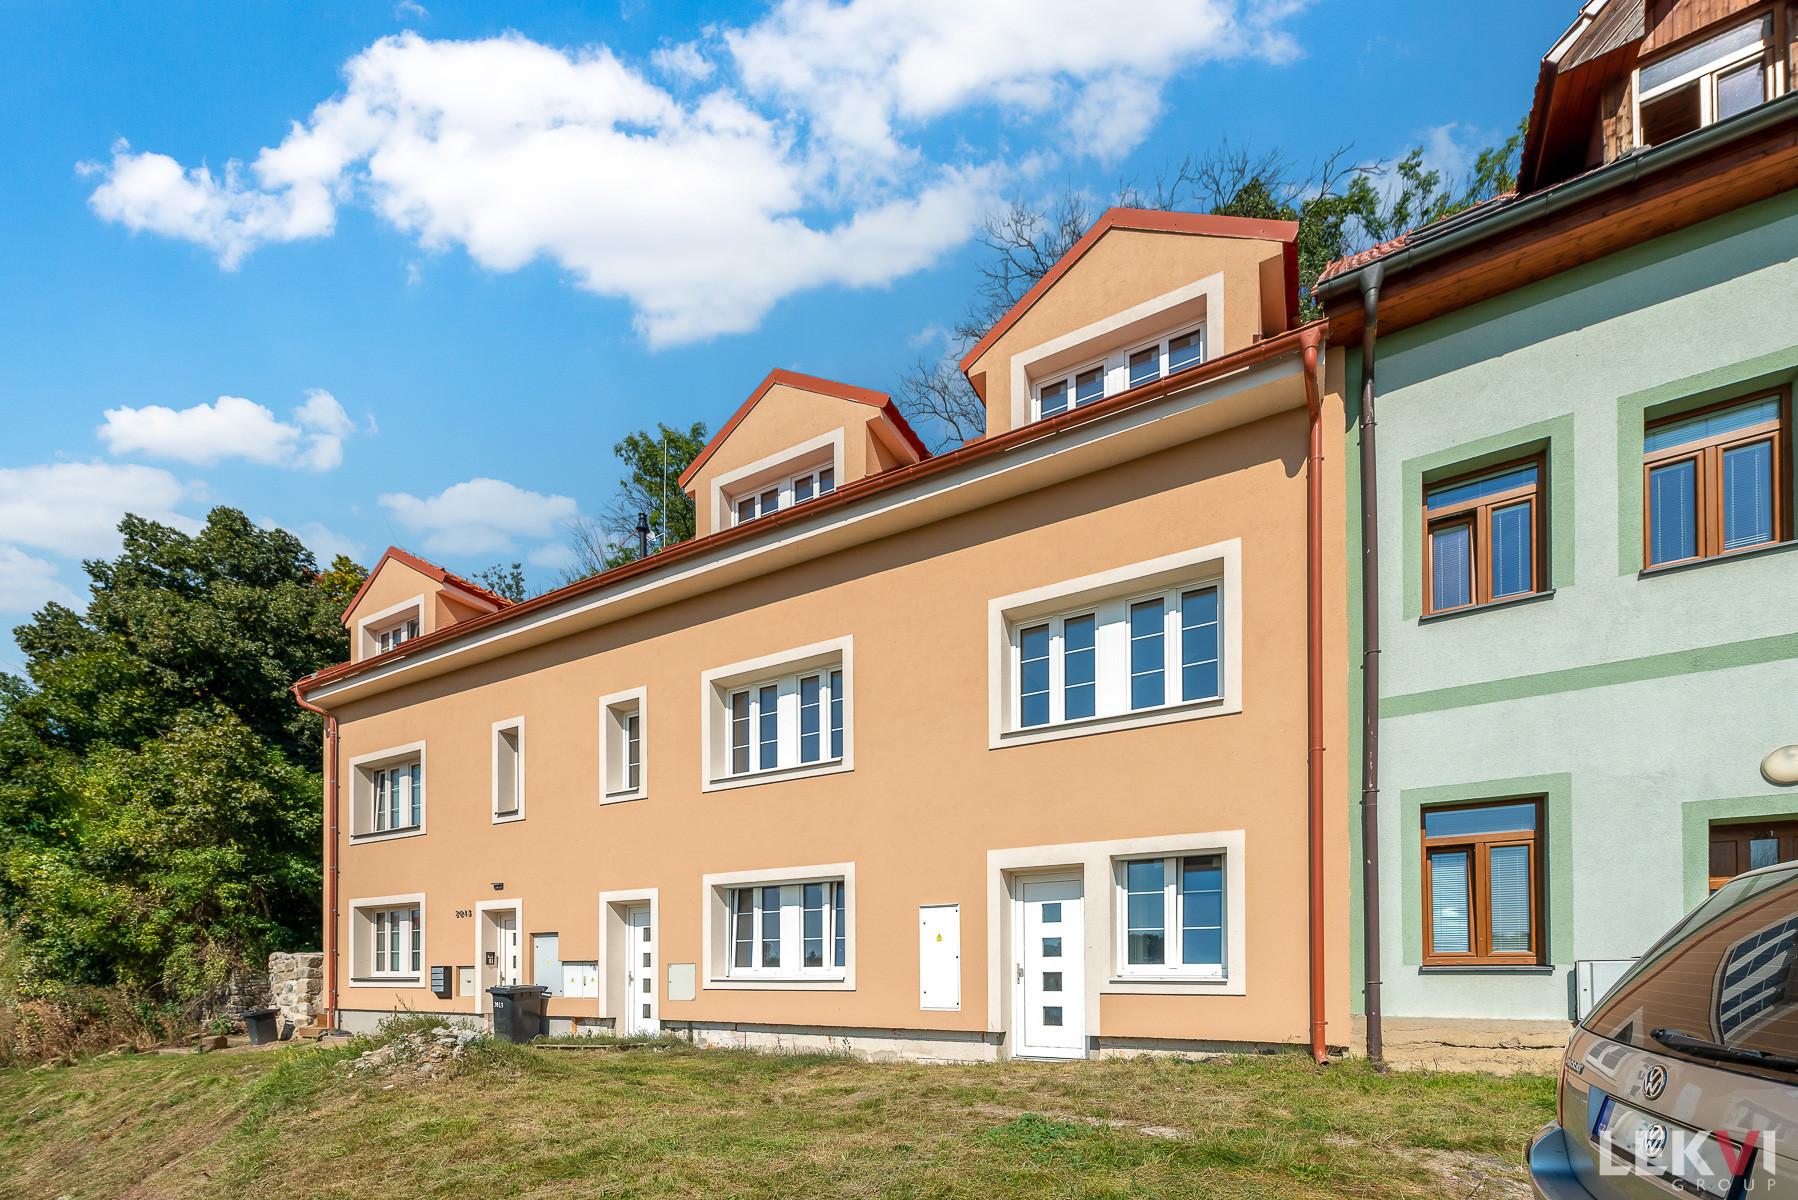 Prodej domu rodinný, 210 m2 - Pod Horou, Kladno